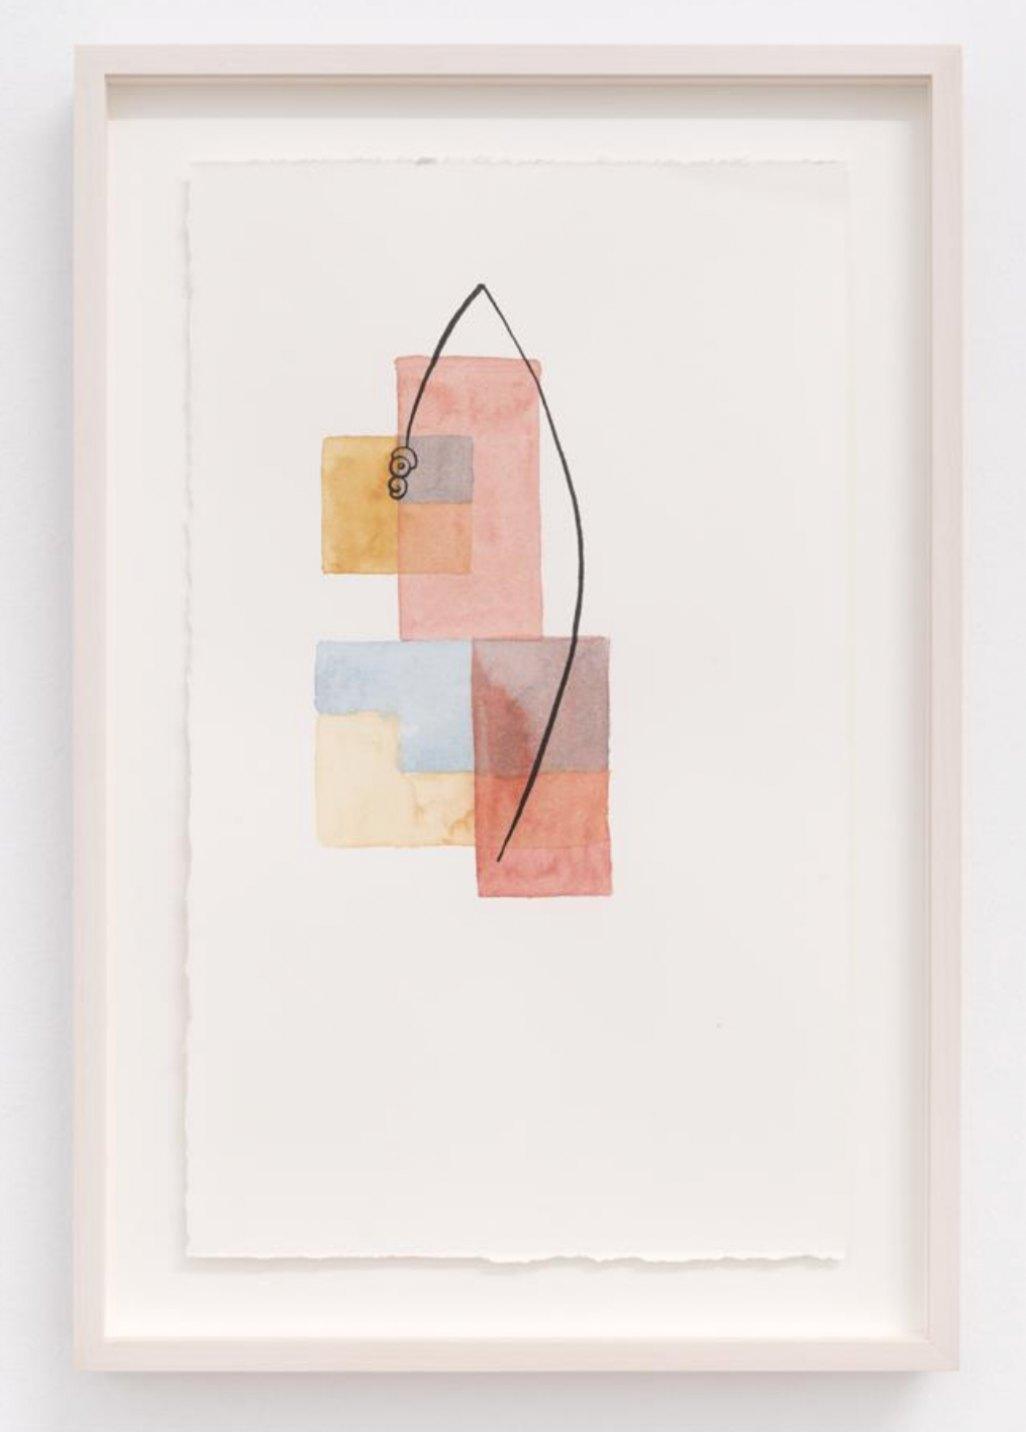 Mariana Castillo Deball,<em> Pedernal II,</em> 2017, watercolor on paper, 35,5 × 21,5 cm - Mendes Wood DM